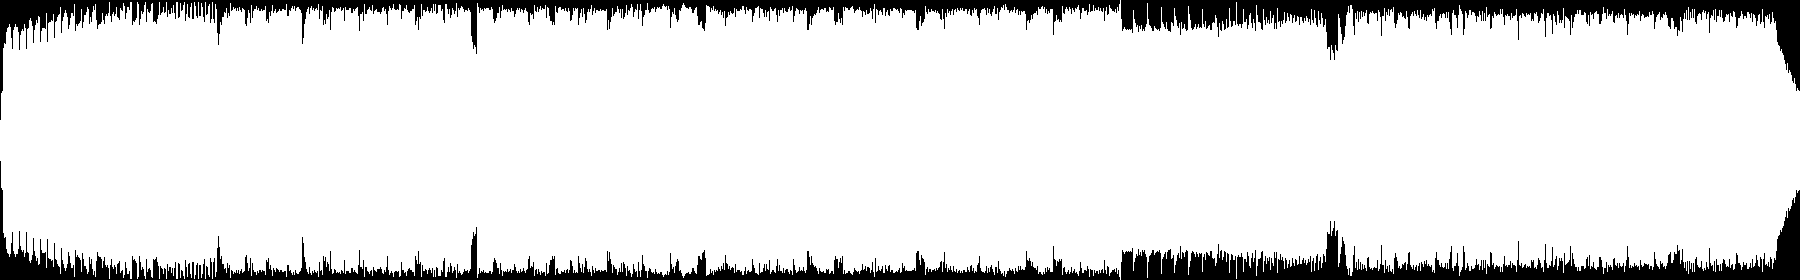 Melodic Dubstep audio waveform